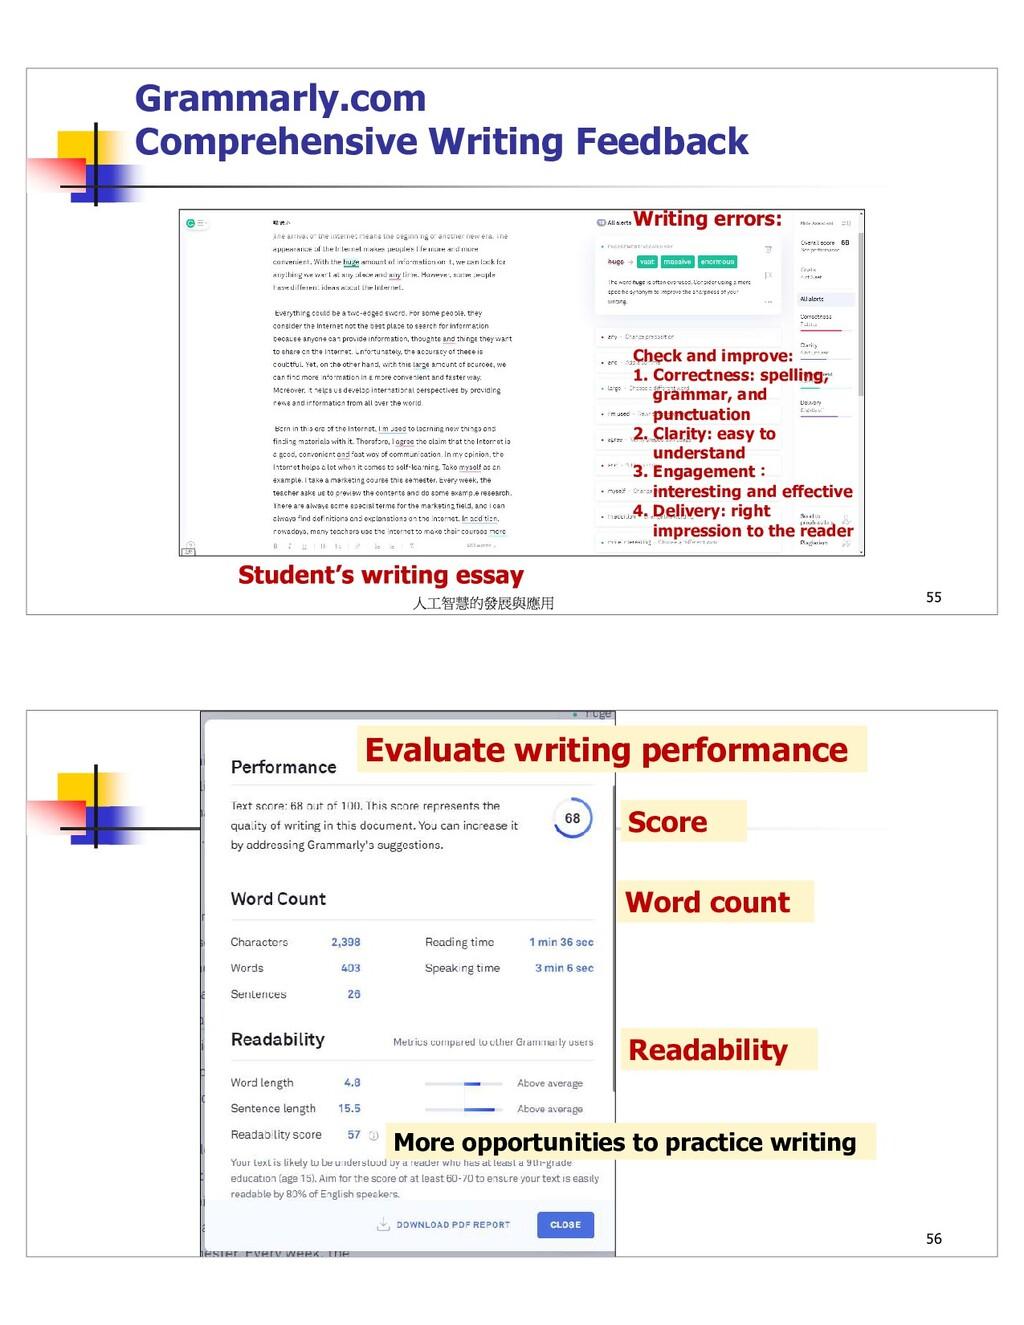 Grammarly.com Comprehensive Writing Feedback Wr...